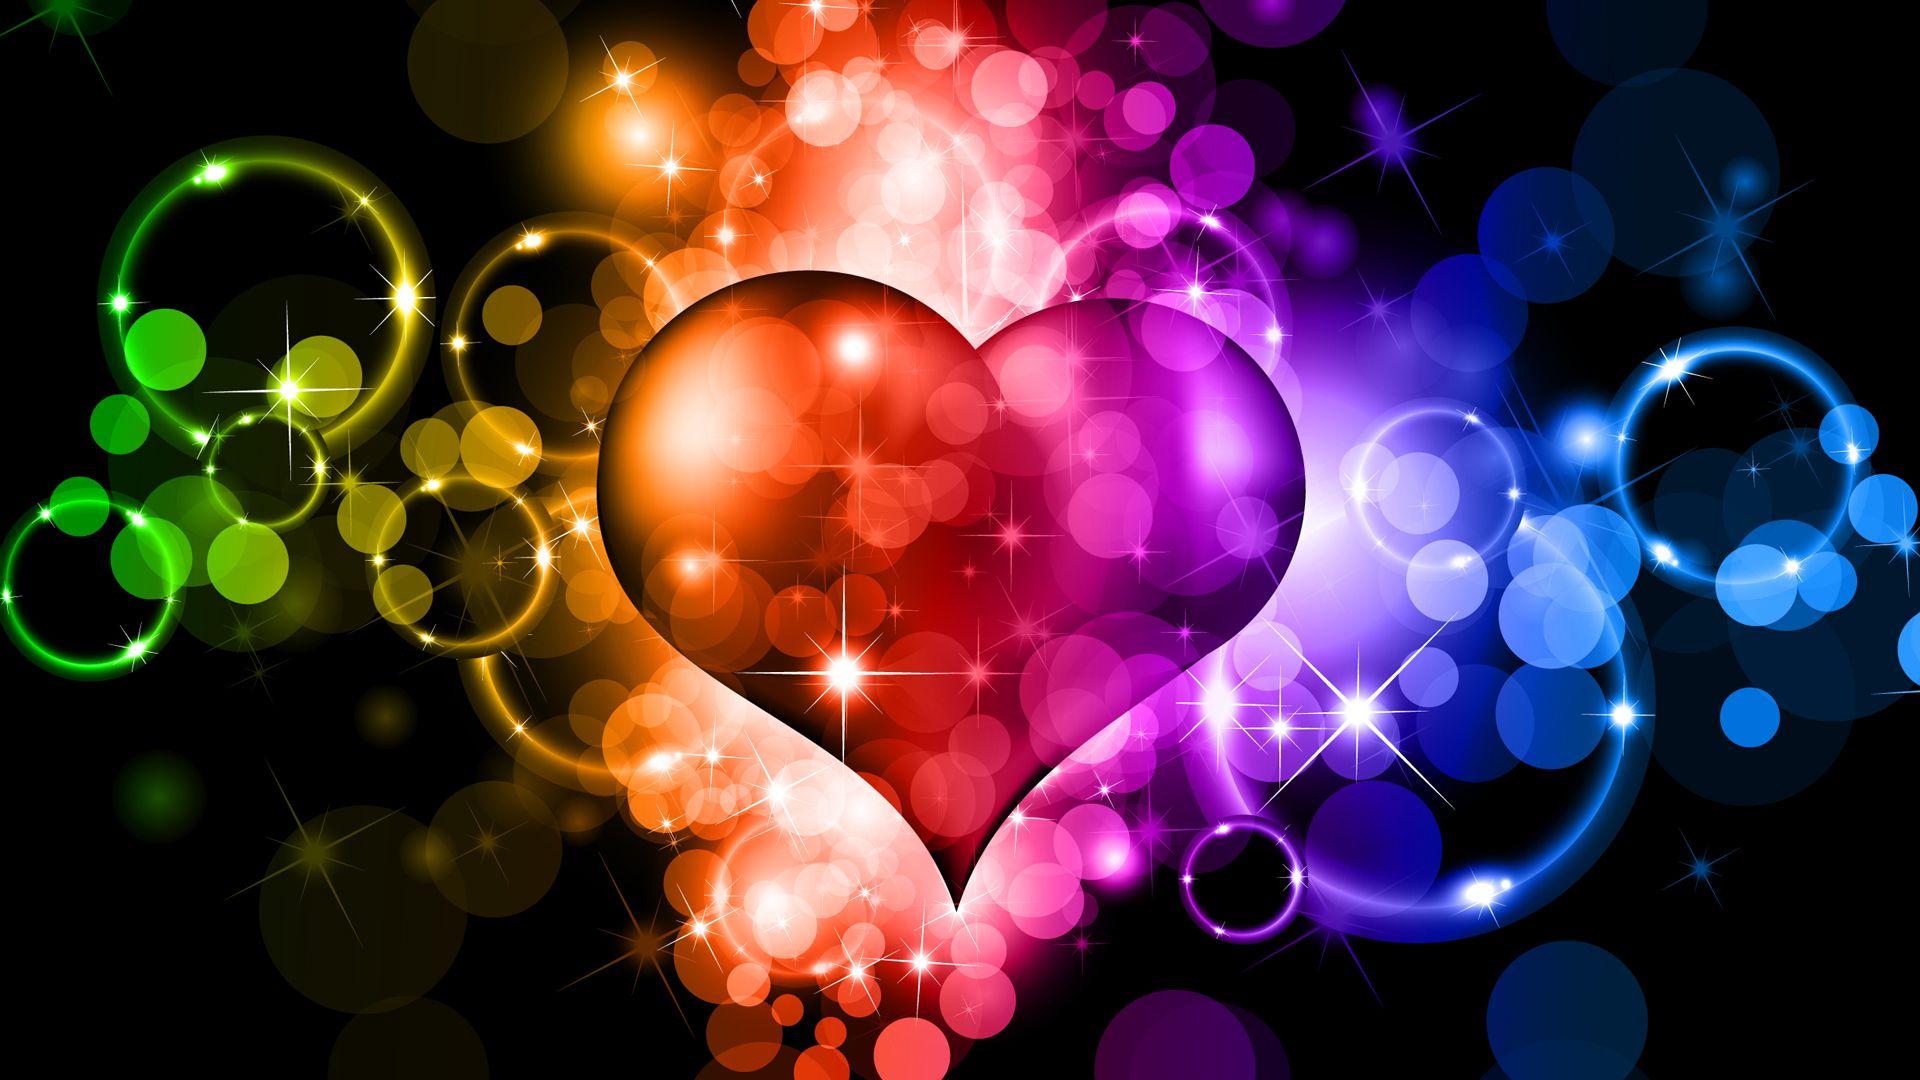 Картинки красивые и яркие сердечки